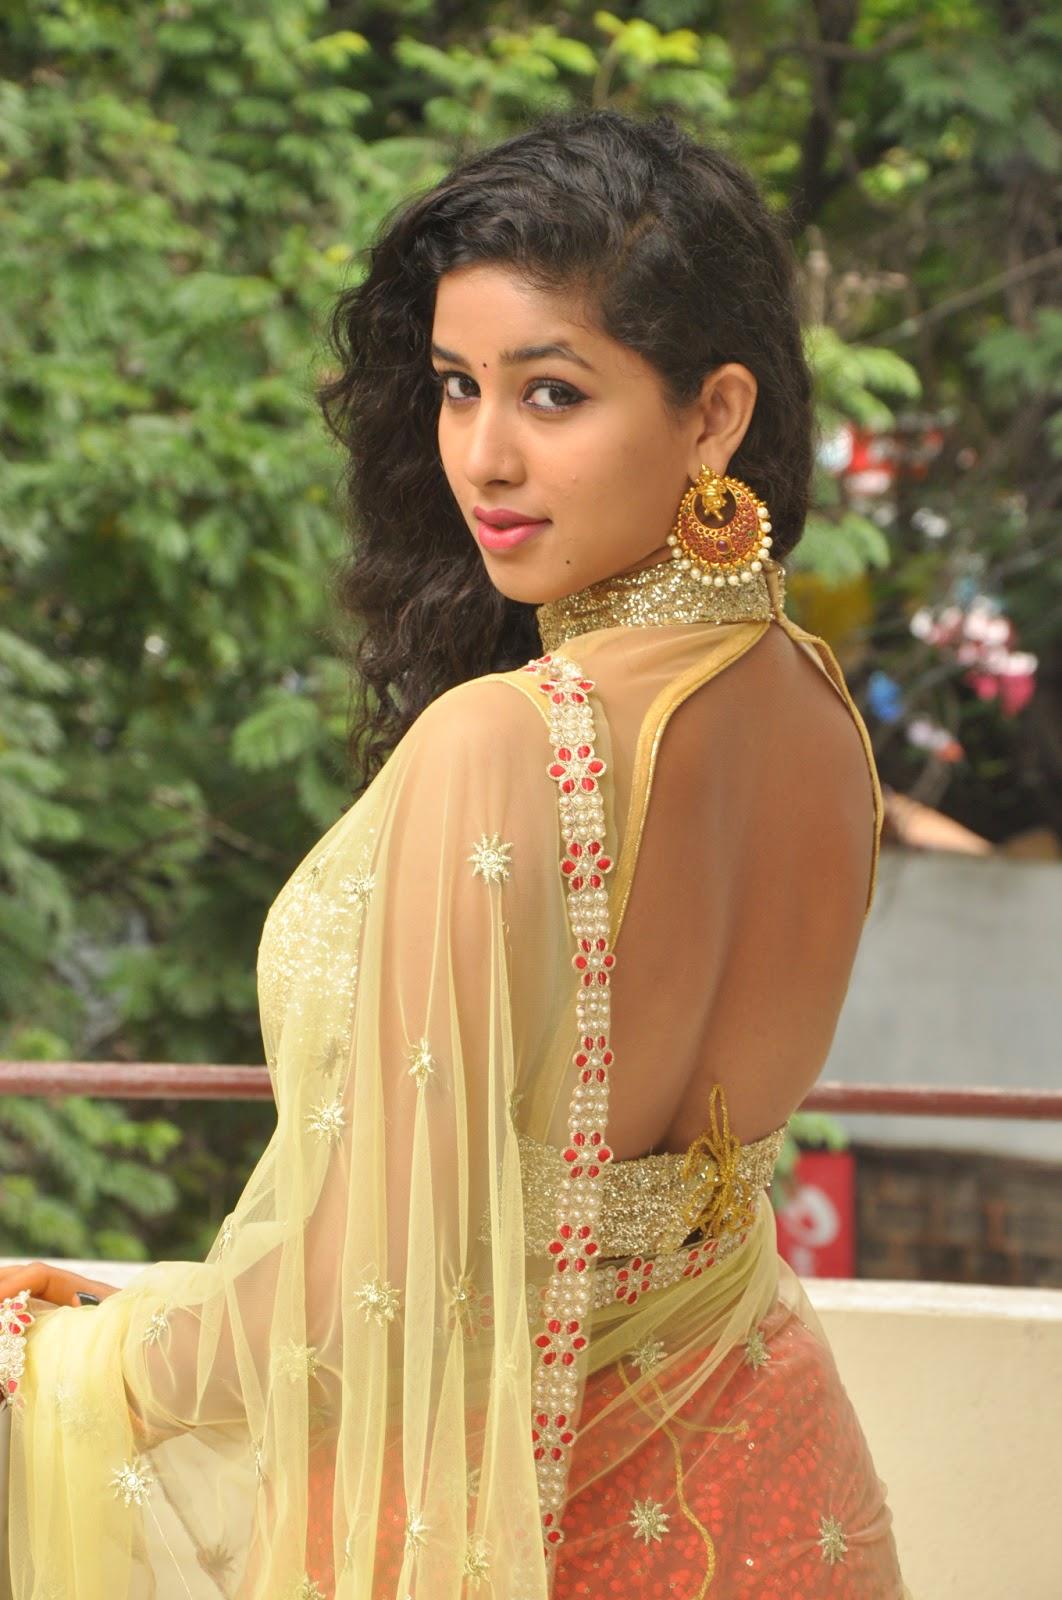 Desi Gaand In Saree  Hot Girl Hd Wallpaper-4242